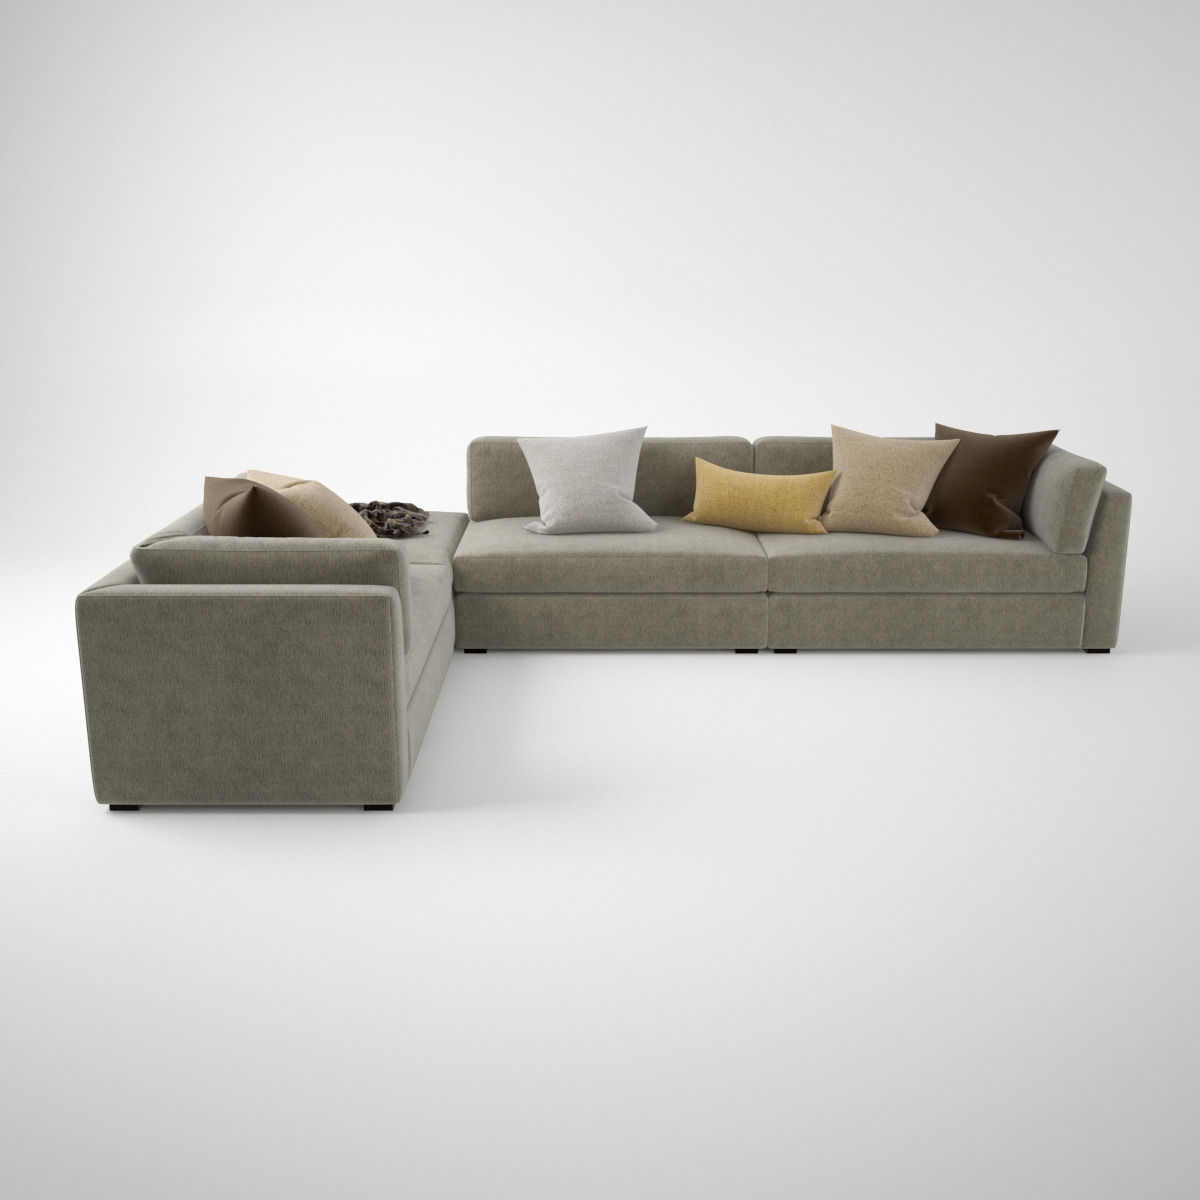 3d Model Busnelli Oh Mar Corner Sectional Sofa Cgtrader ~ Sectional Sofa Table Corner